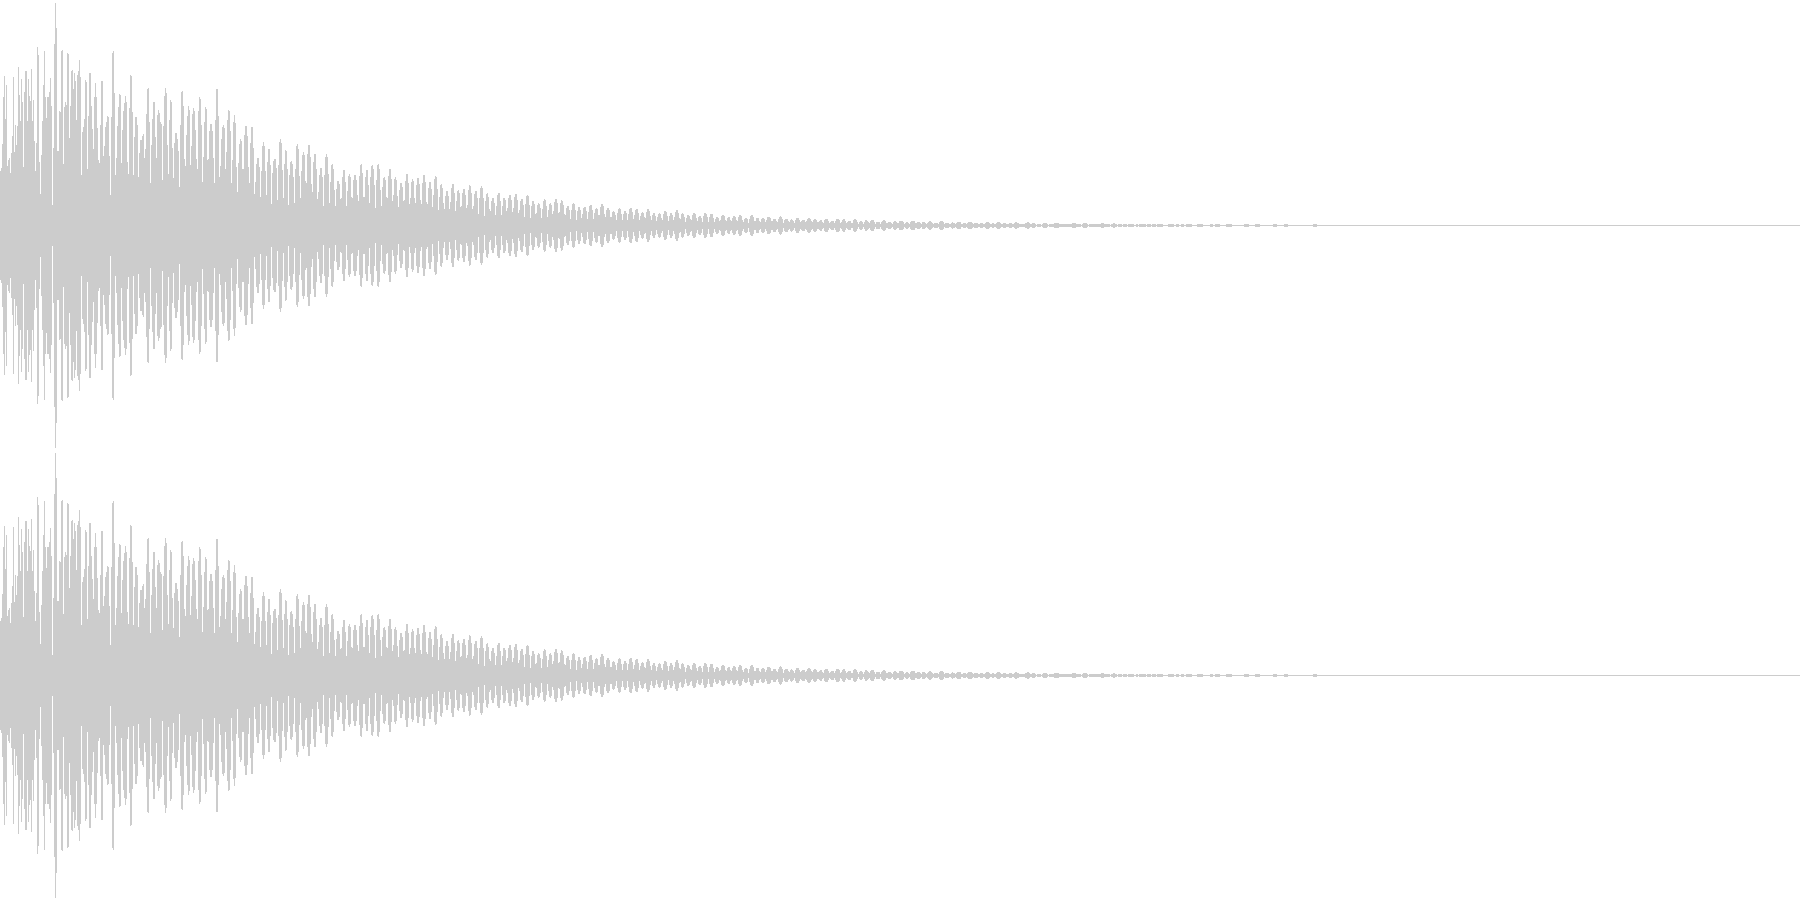 DTM Tom 14 オリジナル音源の未再生の波形